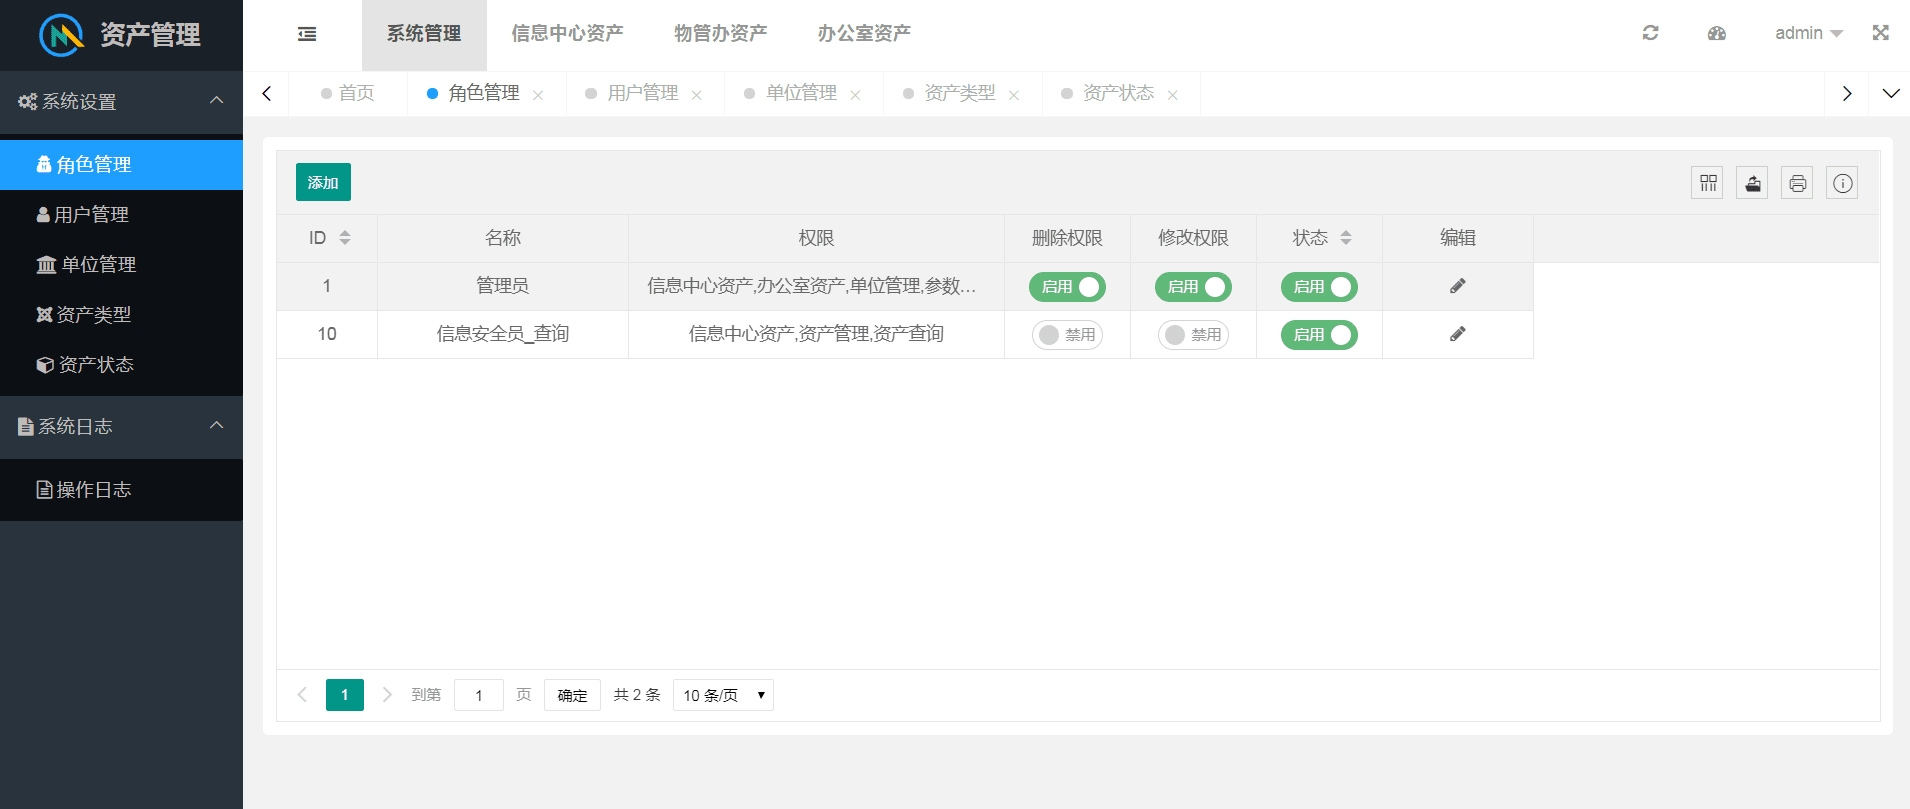 LaYuimini资产管理系统网站源码-找主题源码